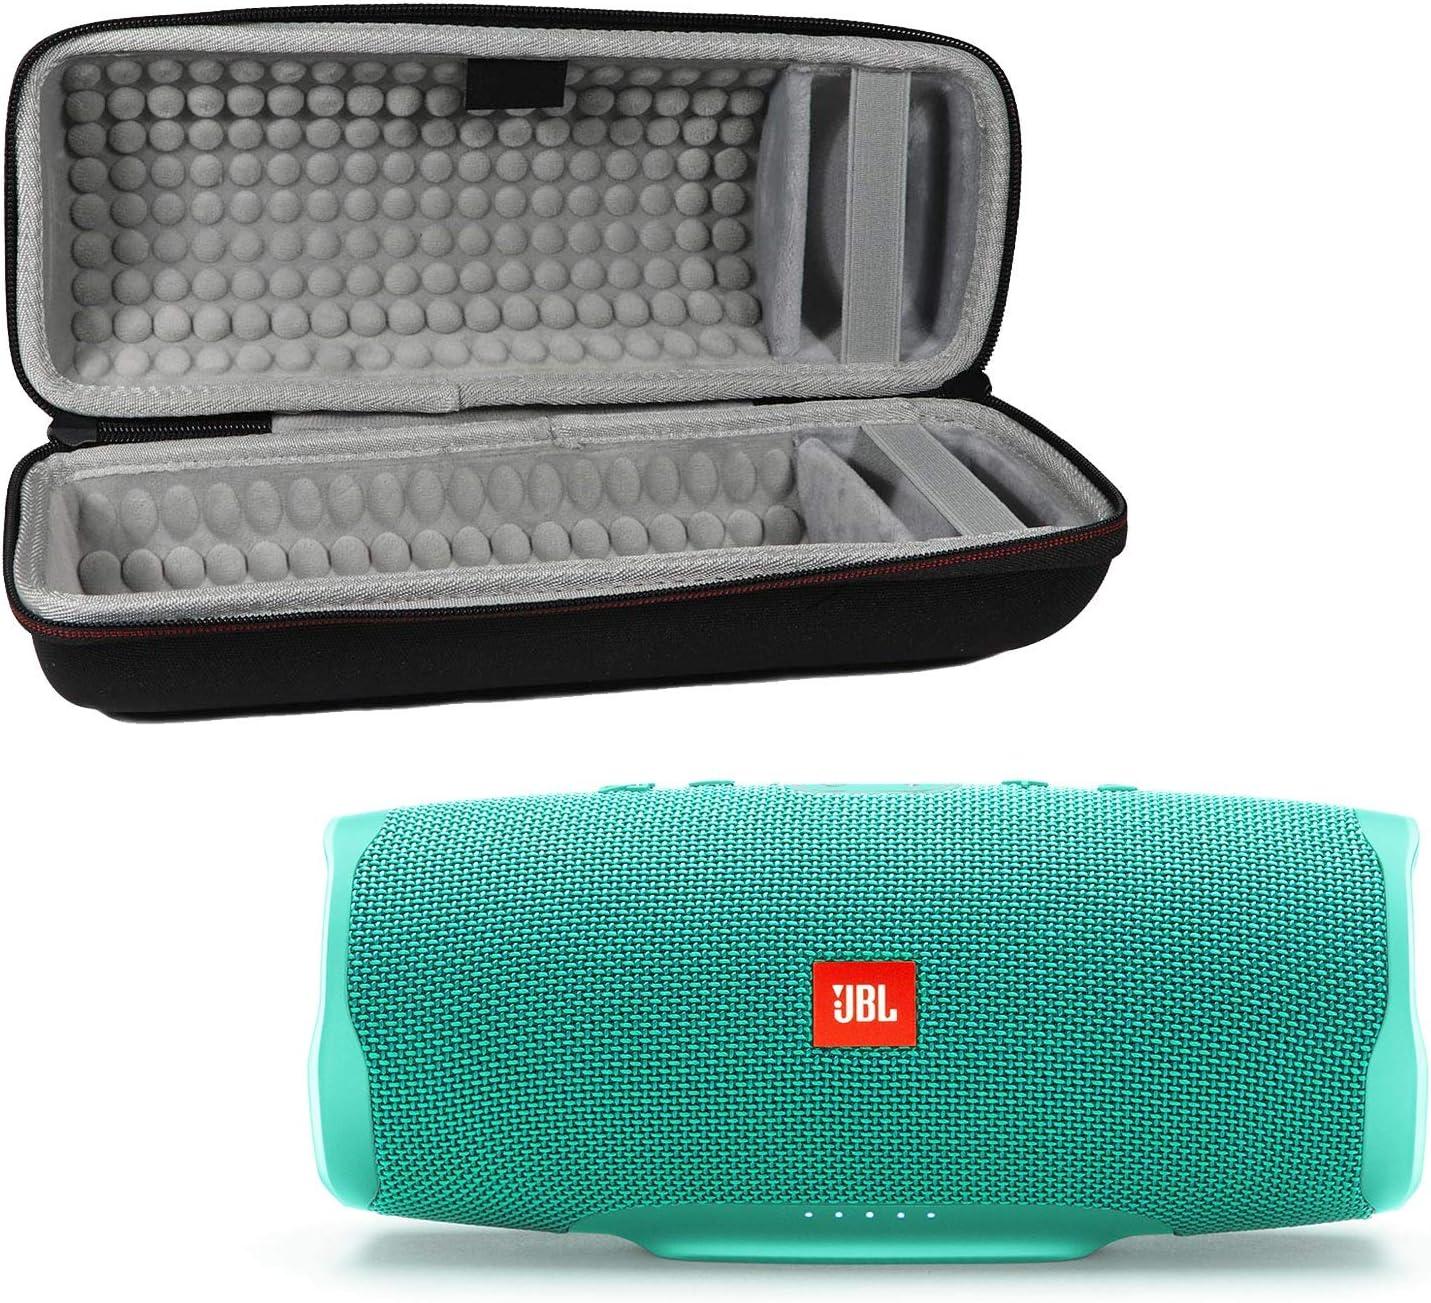 JBL Charge 4 Waterproof Wireless Bluetooth Speaker Bundle with Portable Hard Case - Teal